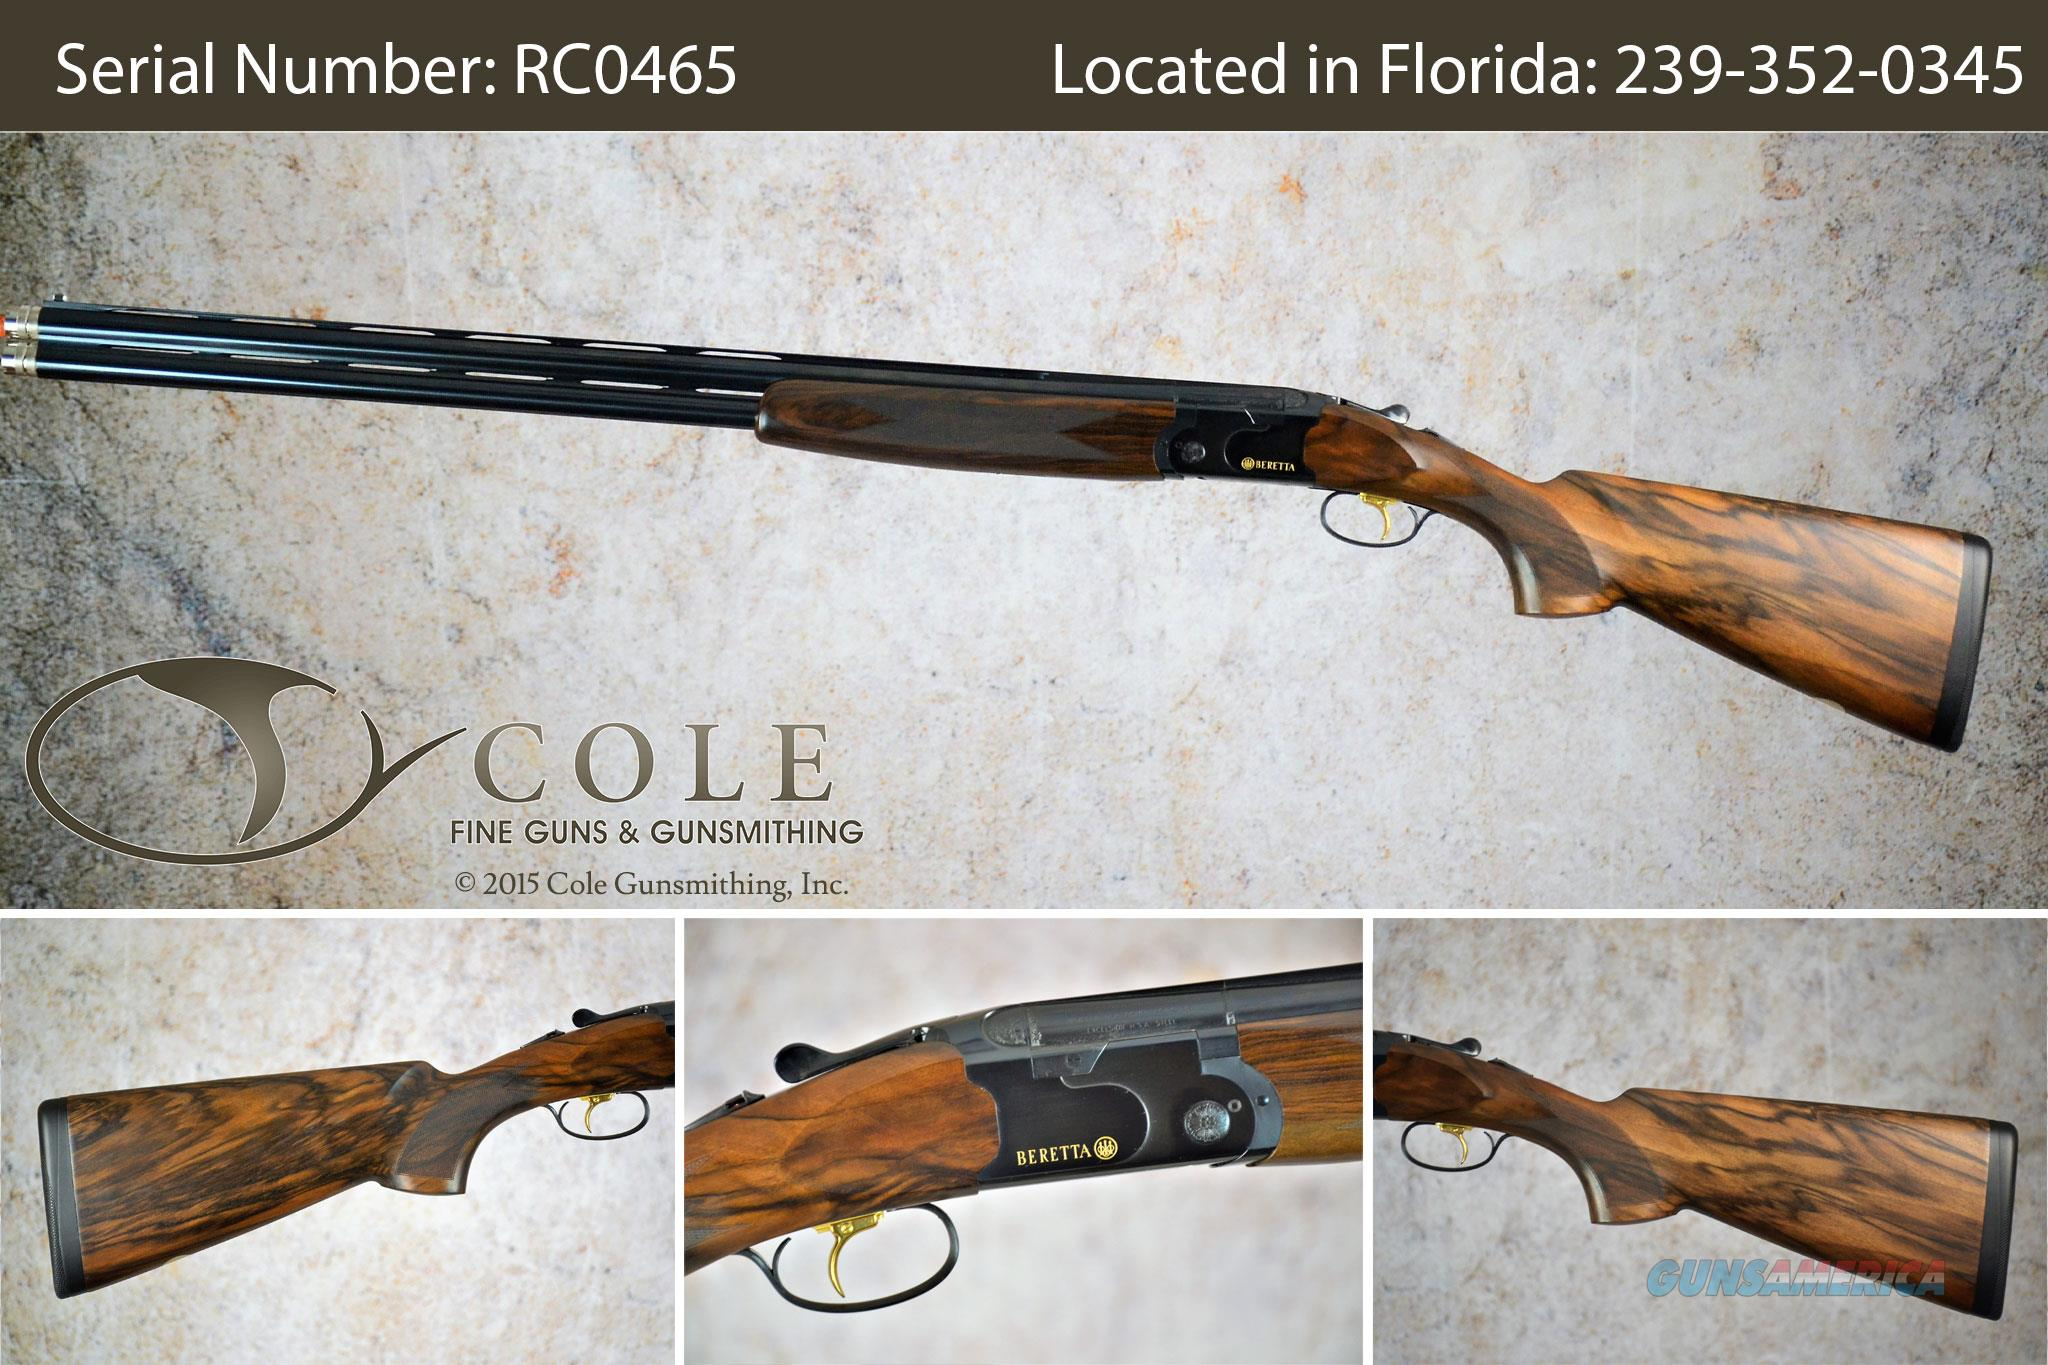 "Beretta 686 Cole Special Sporting 12g 30"" SN:#RC0465  Guns > Shotguns > Beretta Shotguns > O/U > Trap/Skeet"